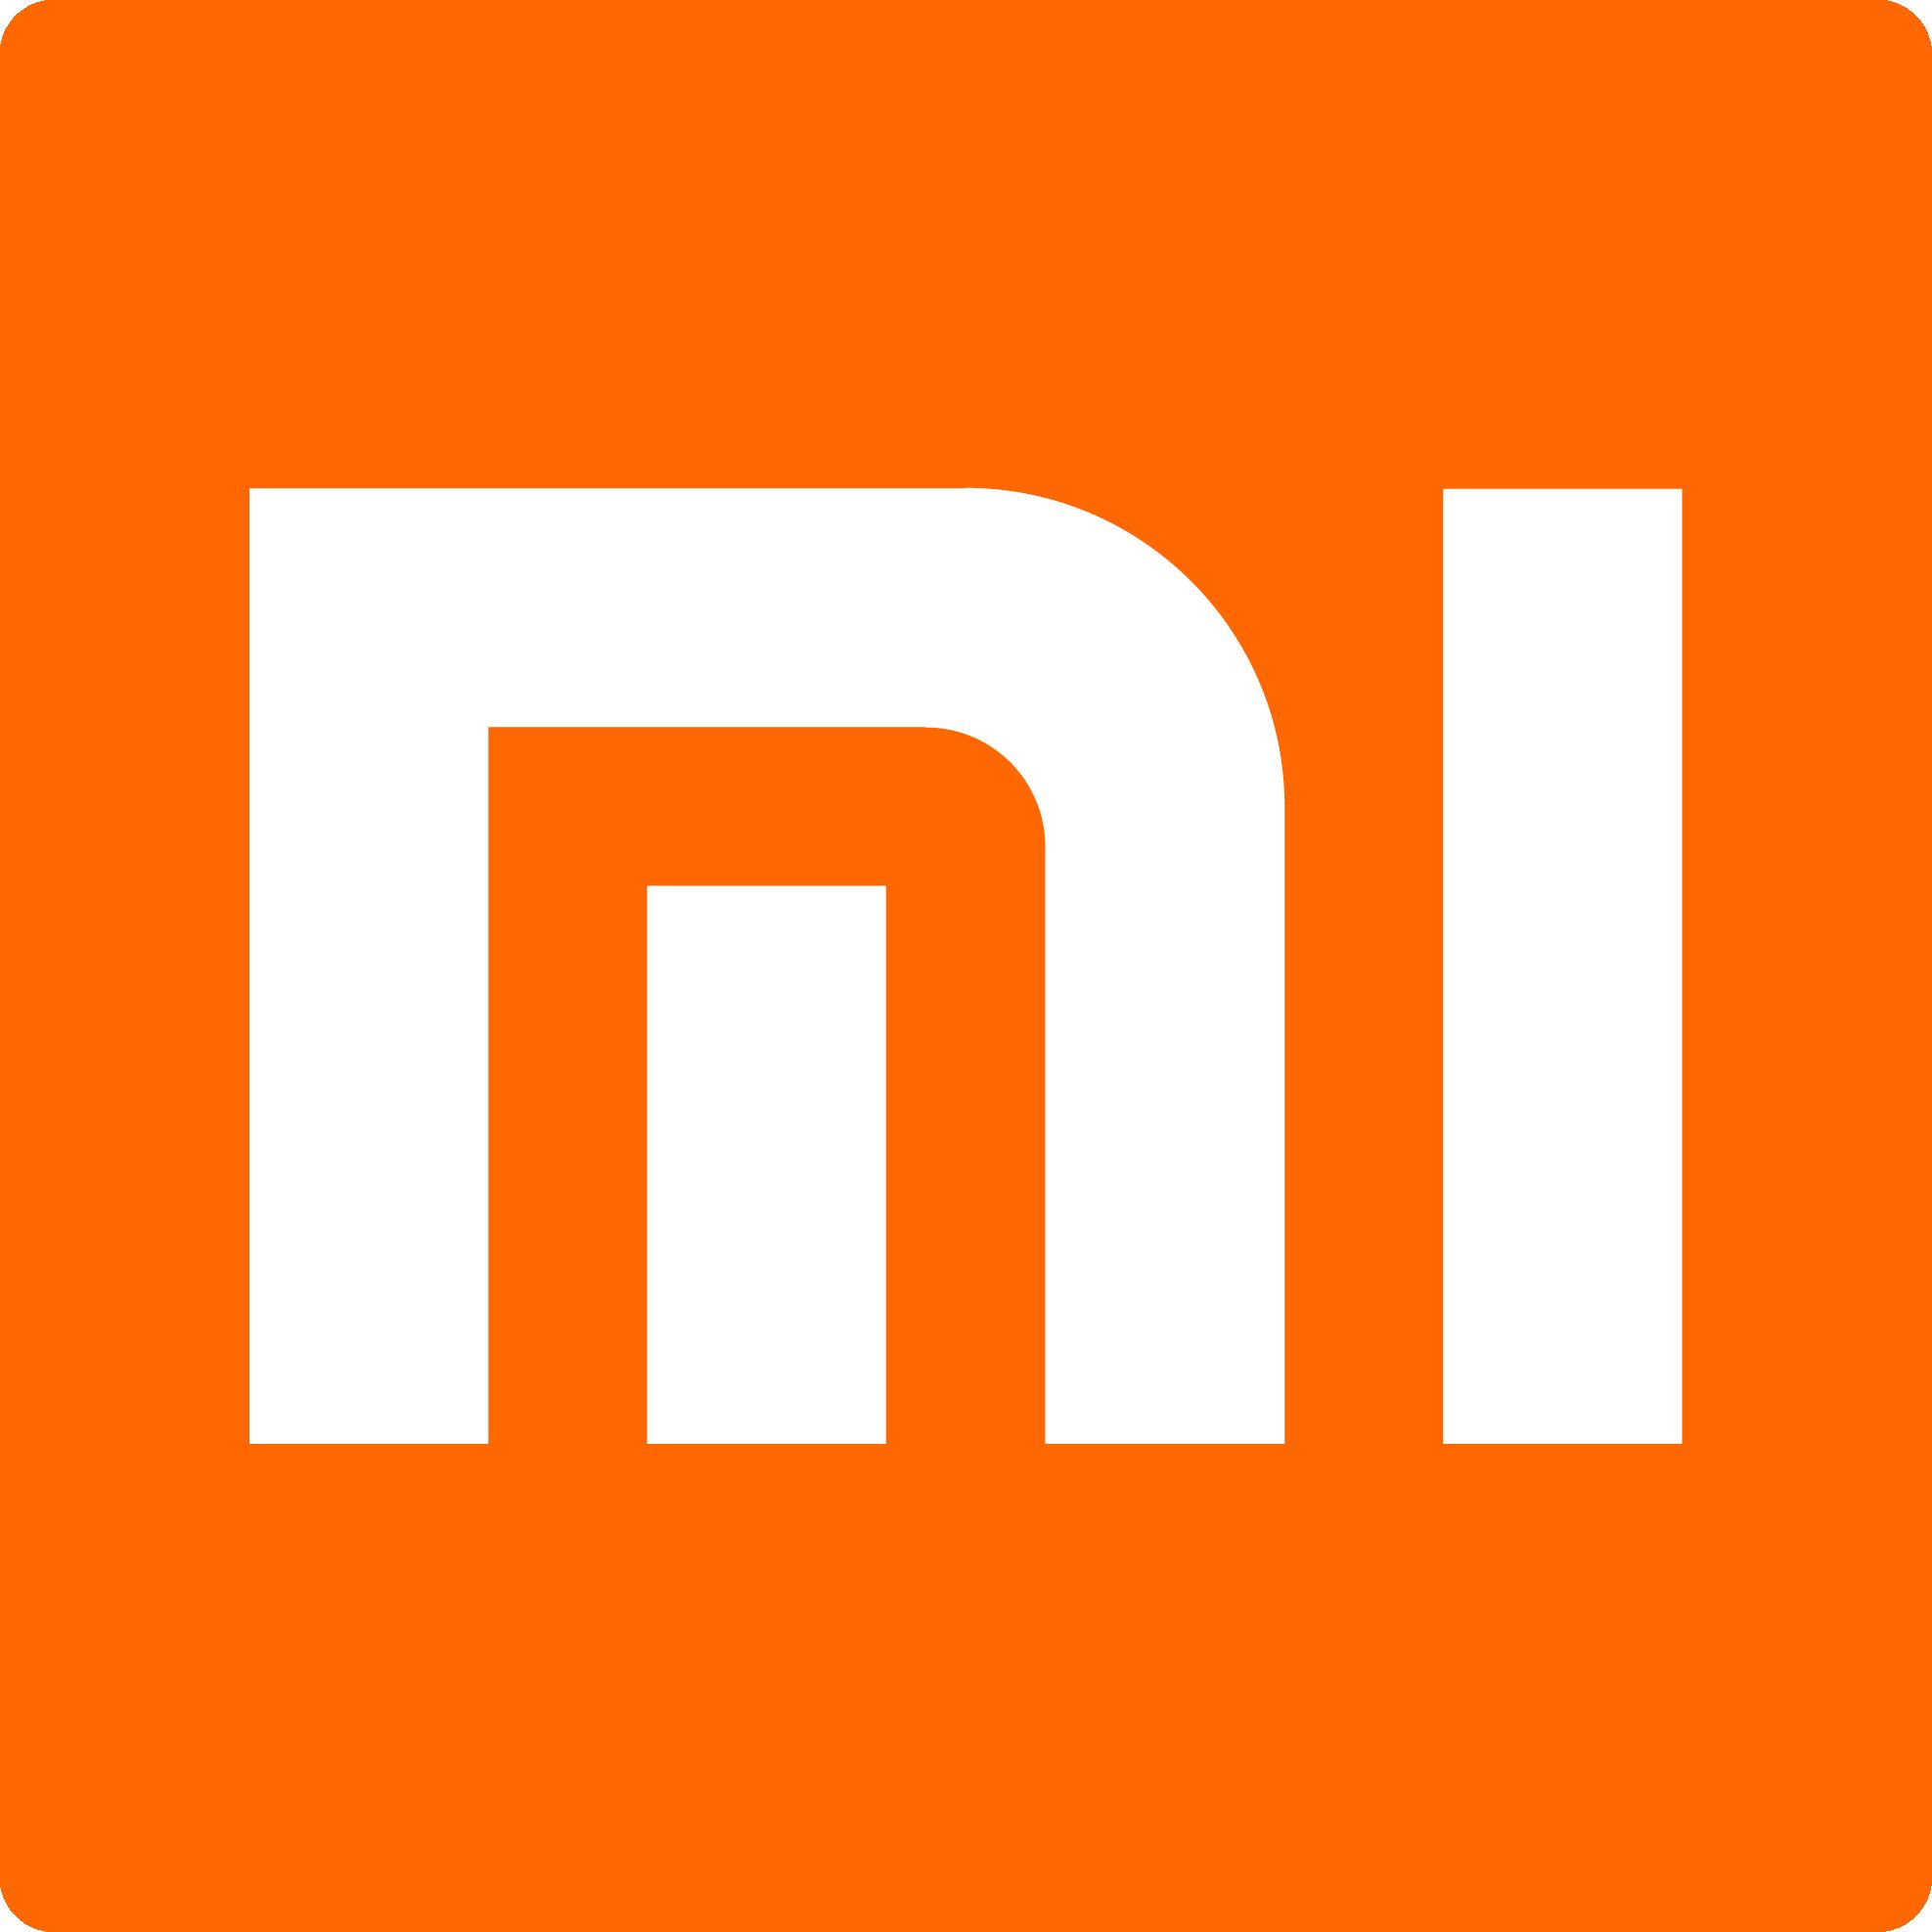 Xiaomi Logo [Mi] Vector EPS Free Download, Logo, Icons.